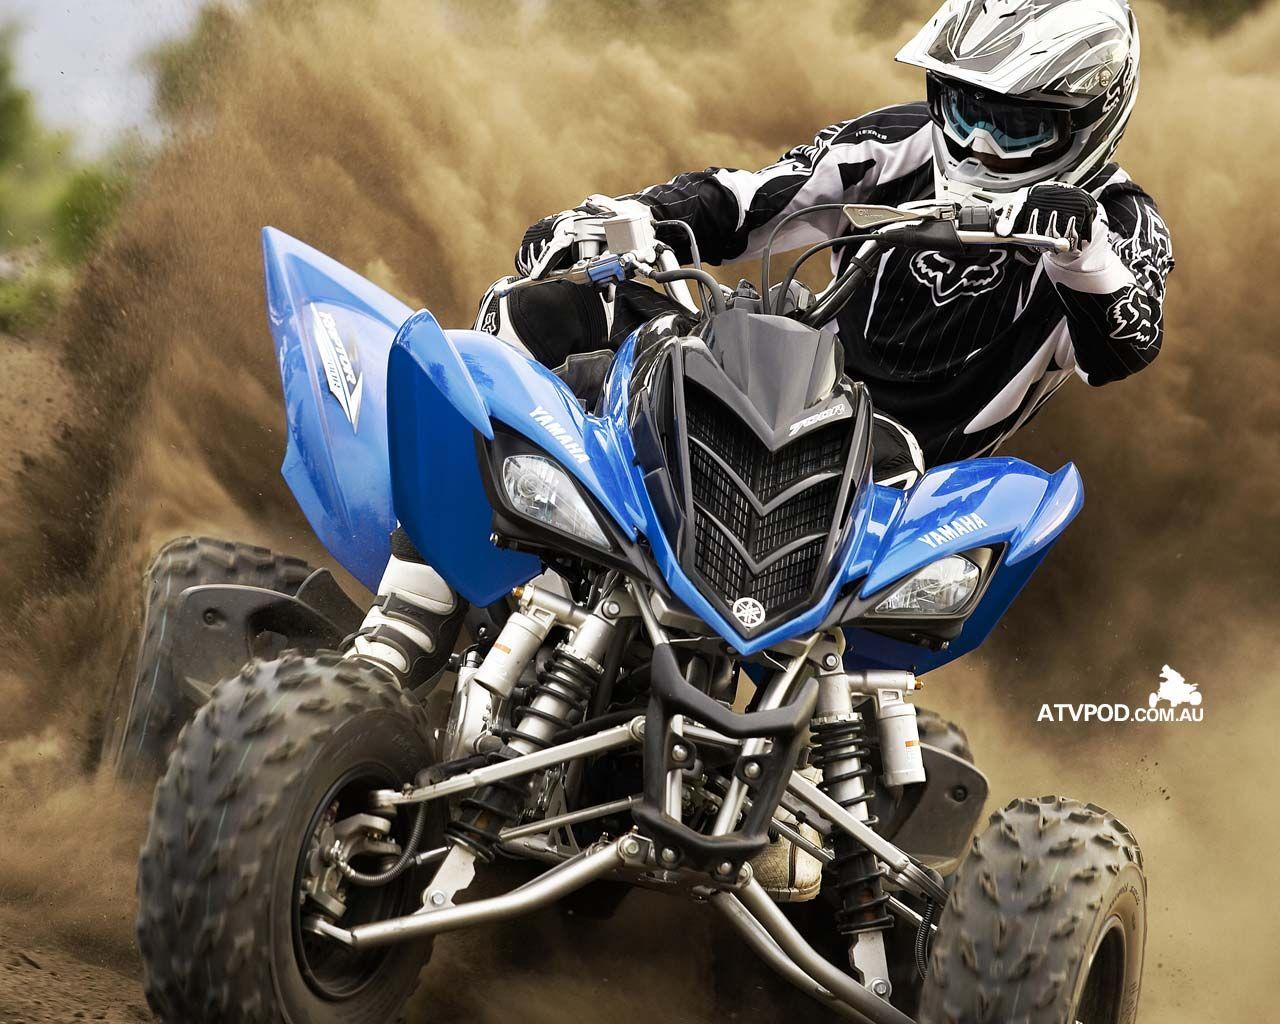 Wallpapers Yamaha Raptor 700 Yamaha Raptor 700 Atv Motocross Atv Quads